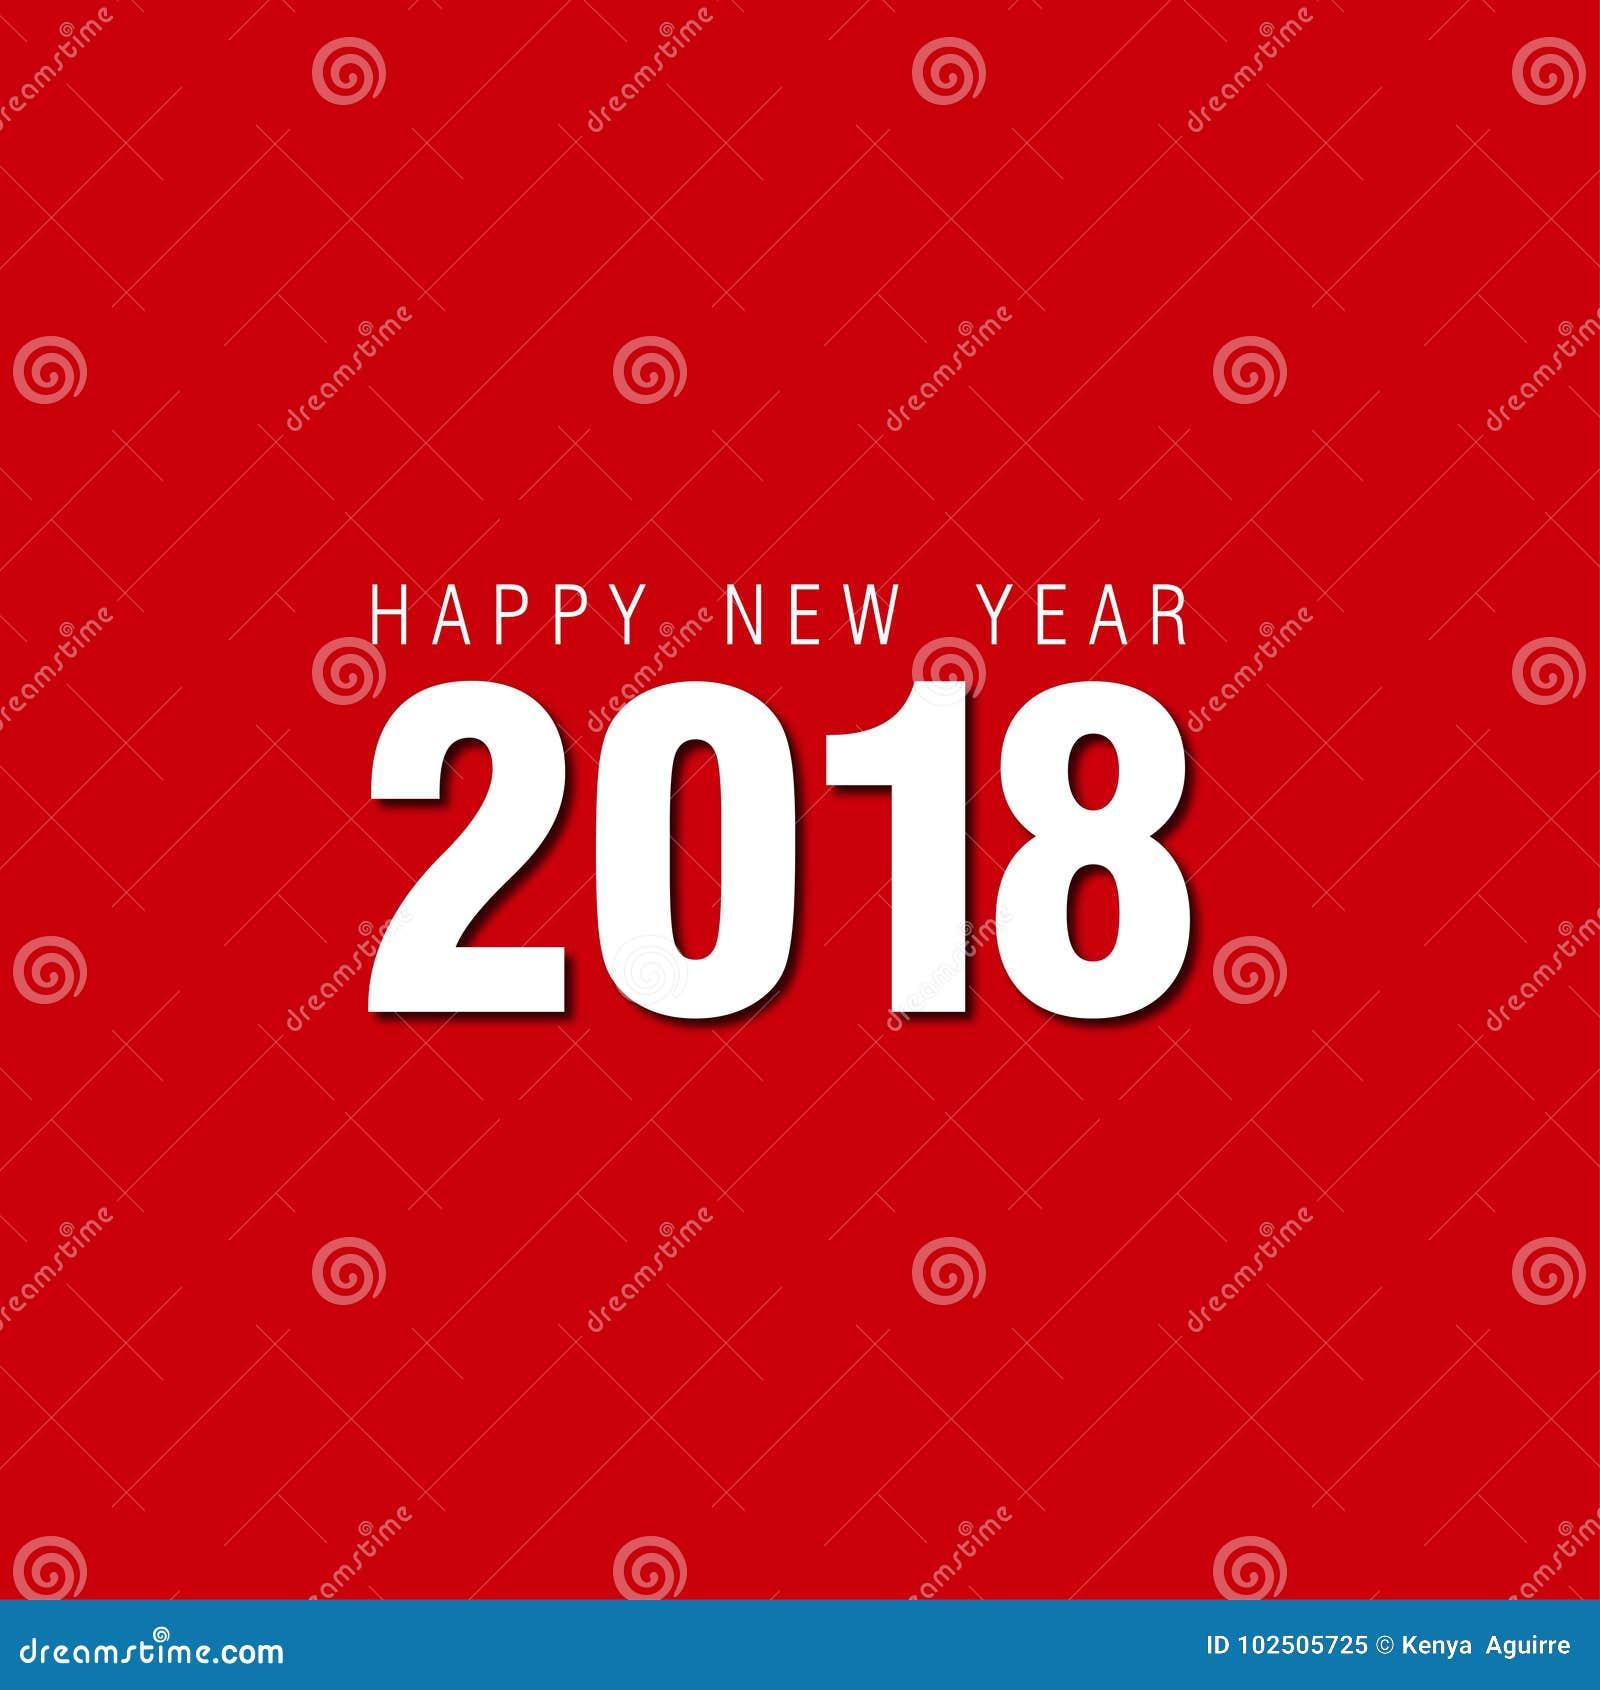 red new year background2018 vectordesign